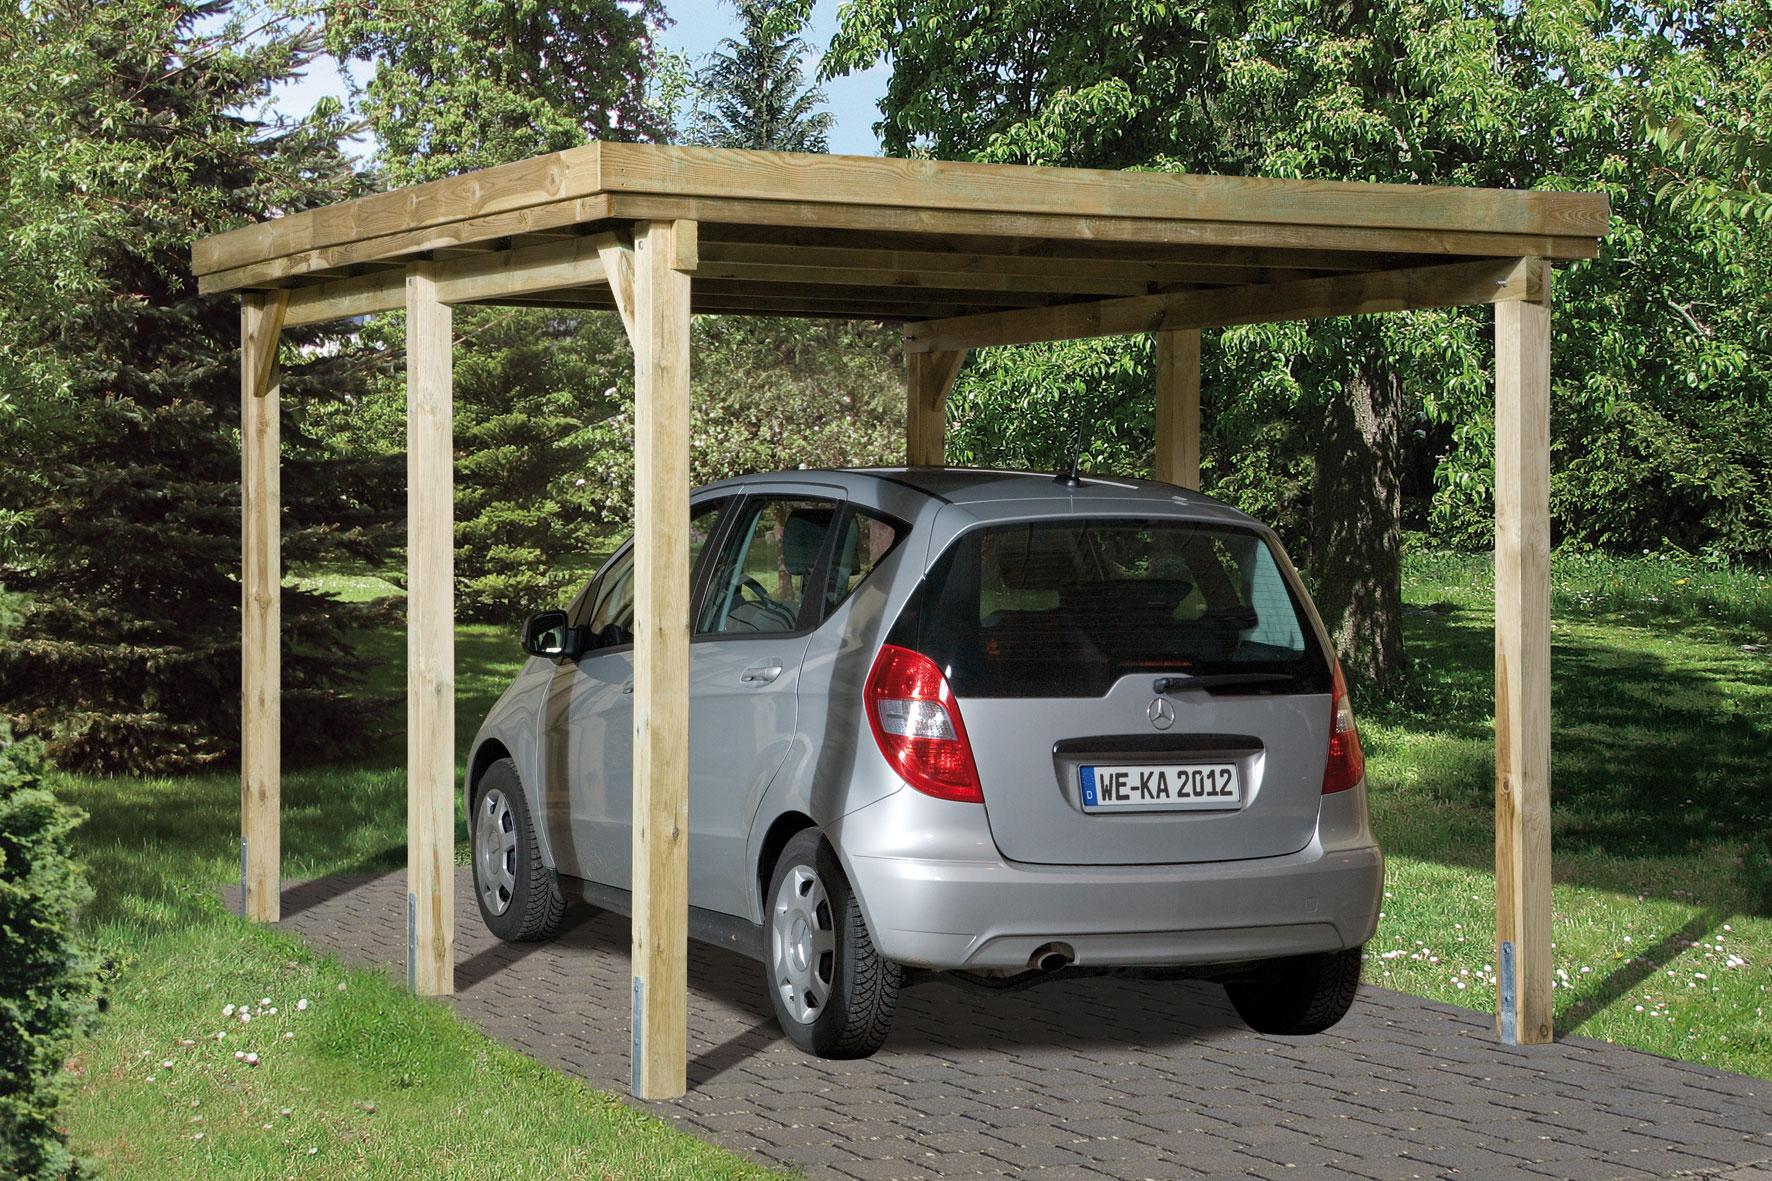 Carport Weka Einzelcarport 617 Gr. 3 Holz kdi + Kunststoff 322x802cm Bild 1